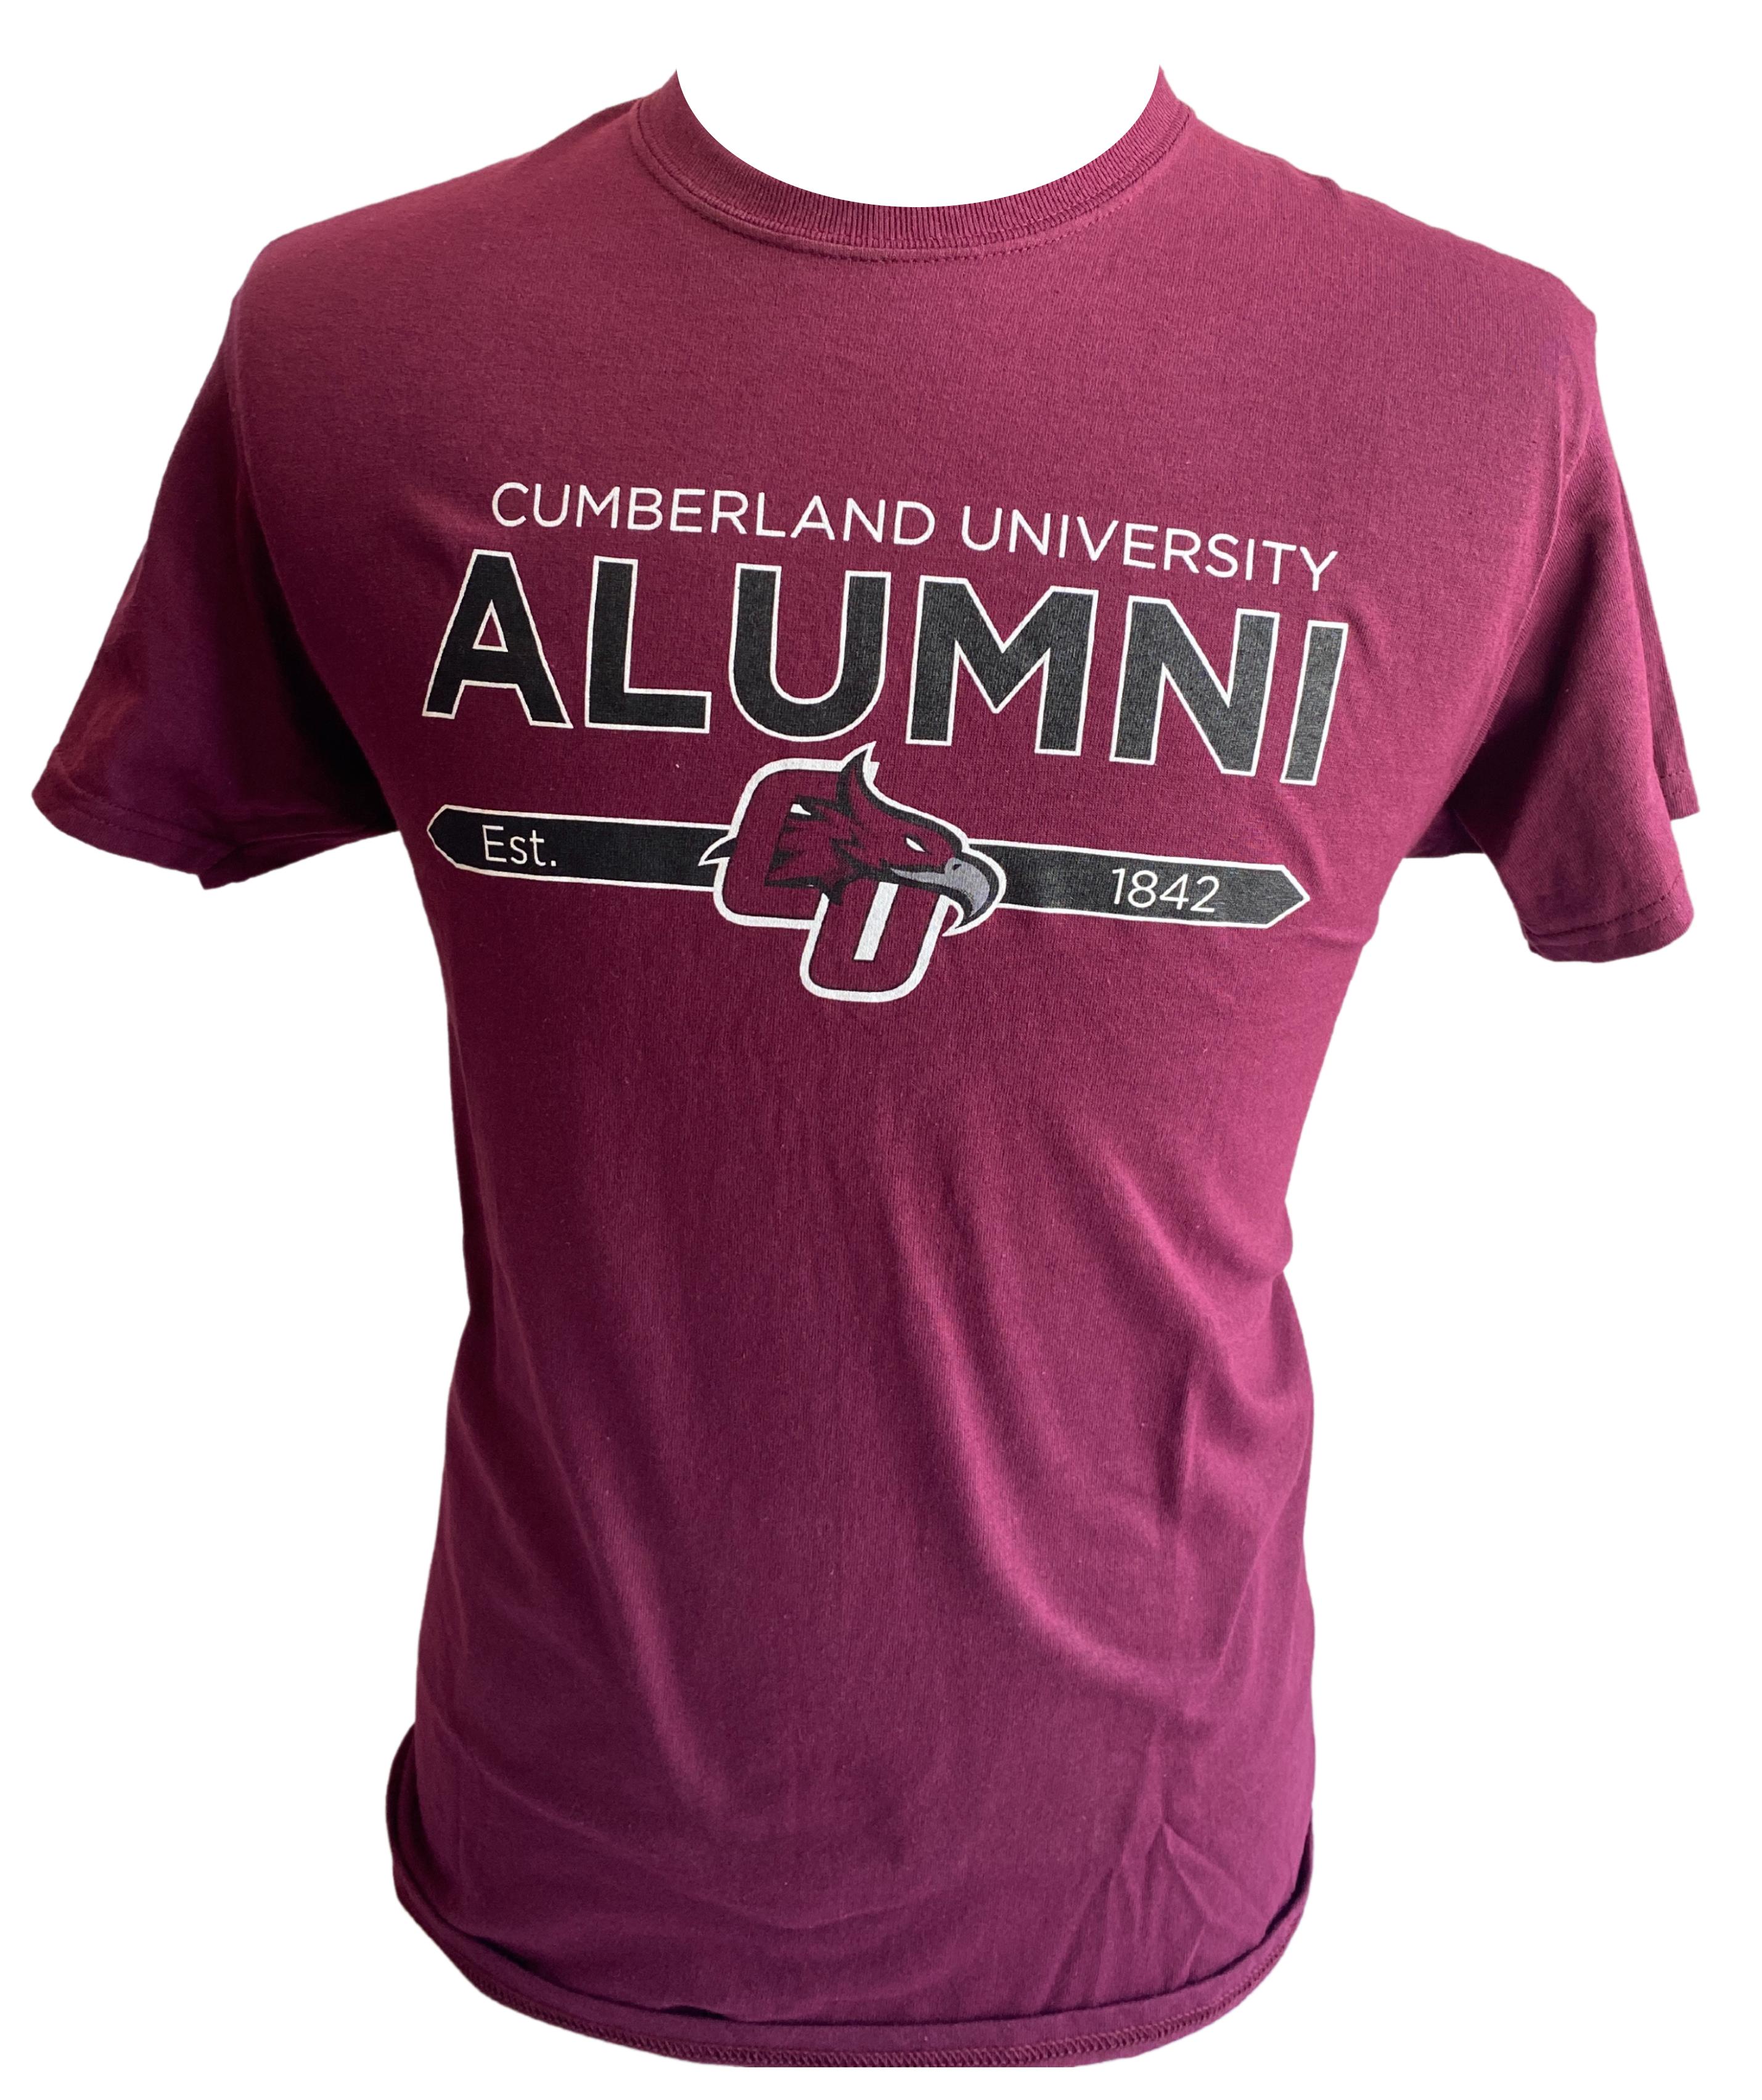 CU Alumni Est. 1842 Tshirt